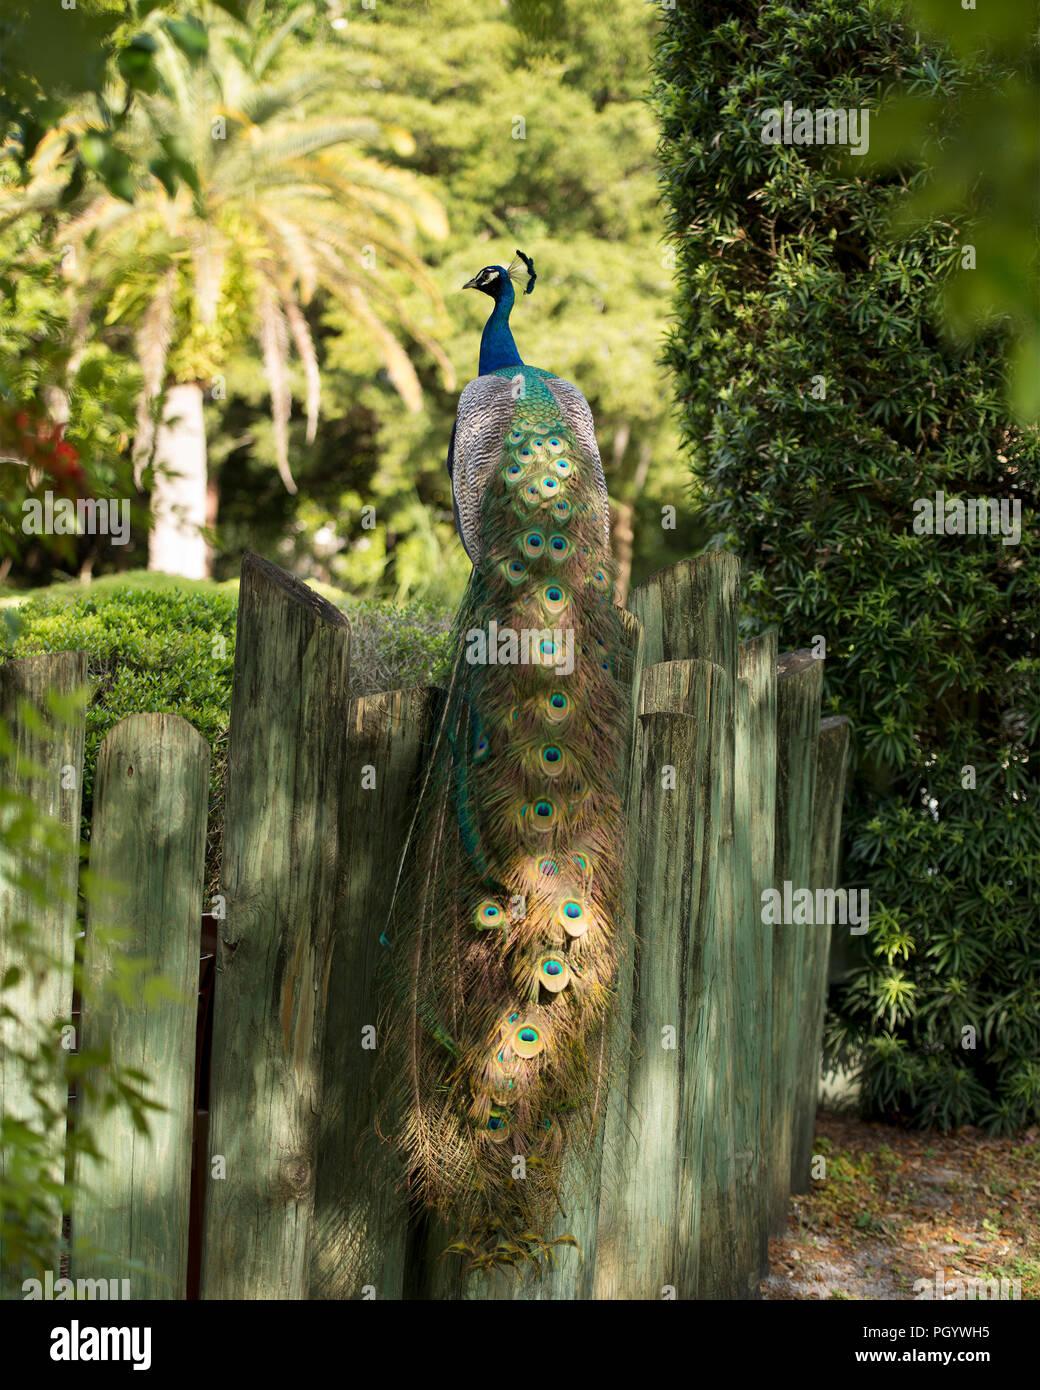 Peacock bird, the beautiful colorful bird. Stock Photo